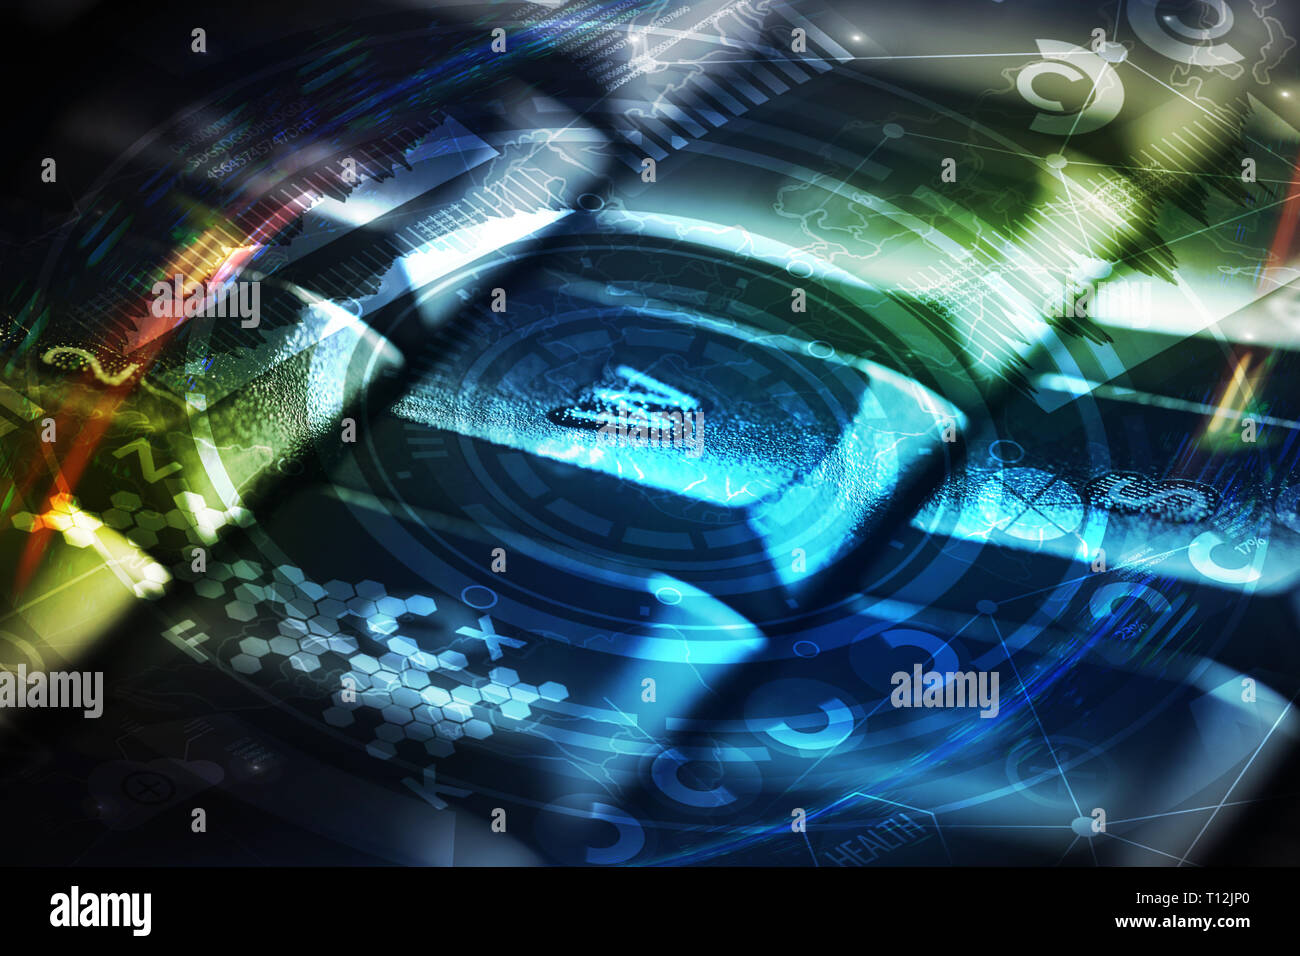 Close-up Dunkel, Tastatur mit Cyber Security Konzept Stockfoto